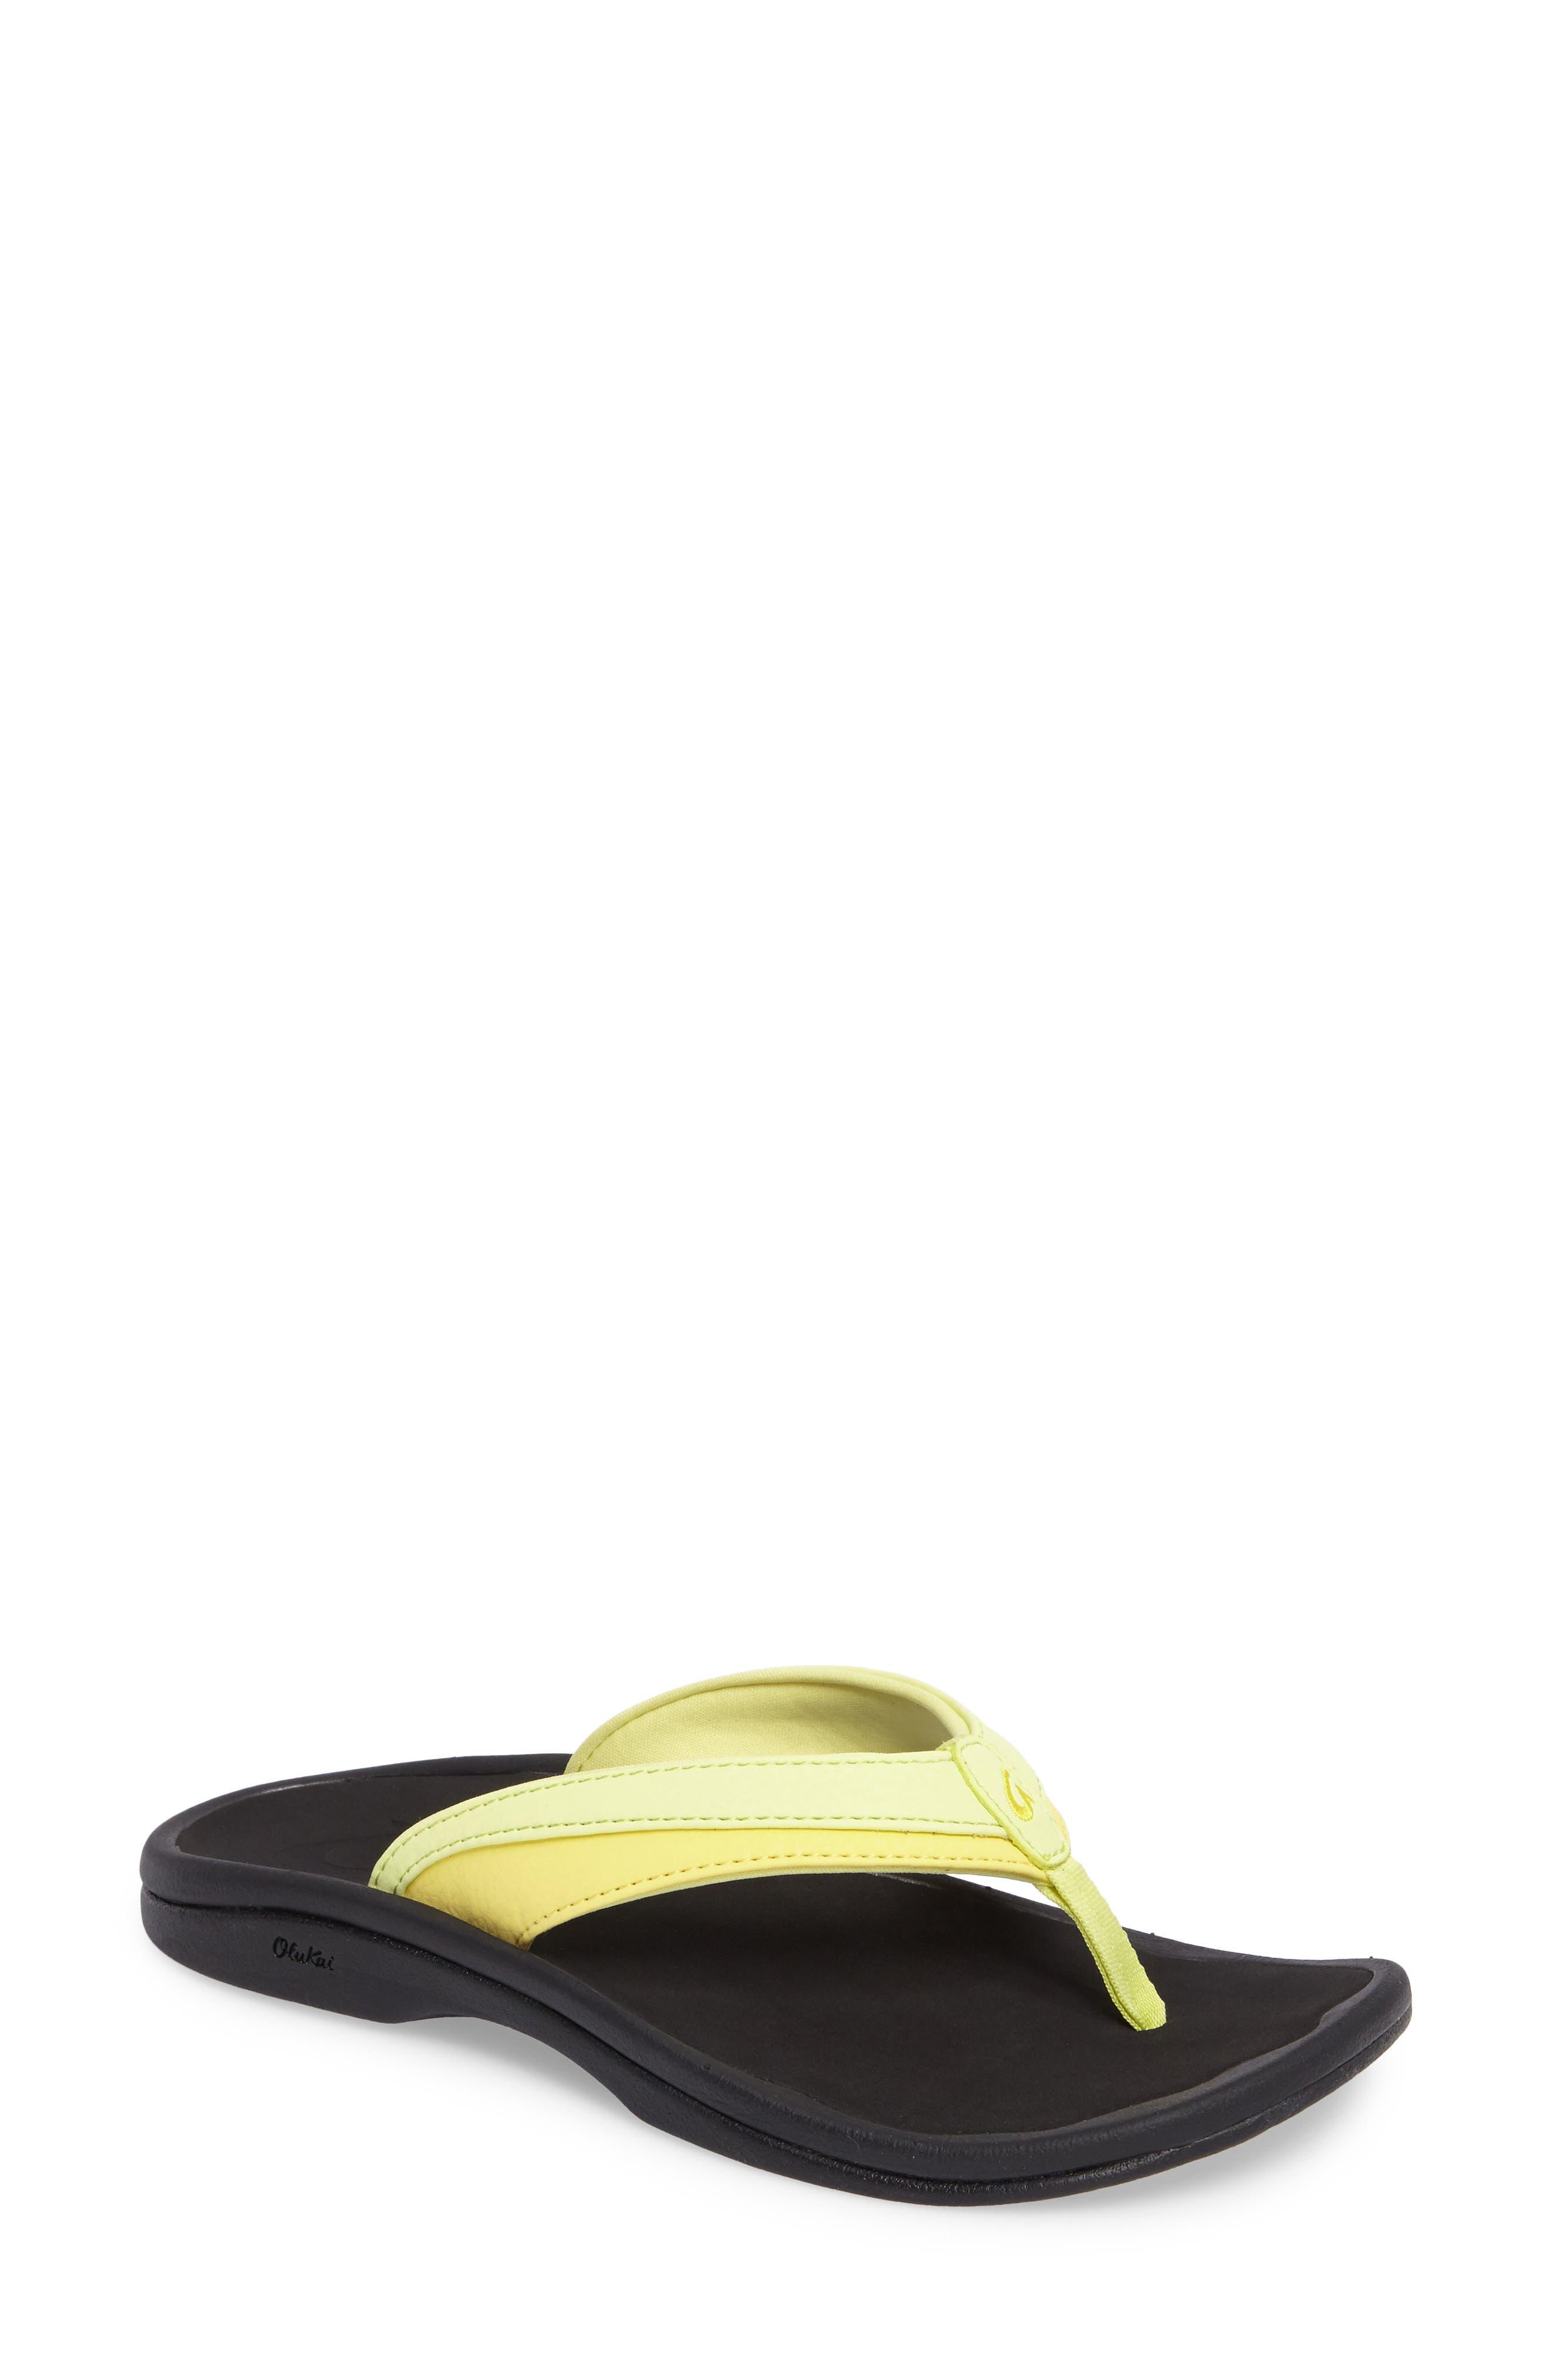 Main Image - OluKai 'Ohana' Sandal (Women)